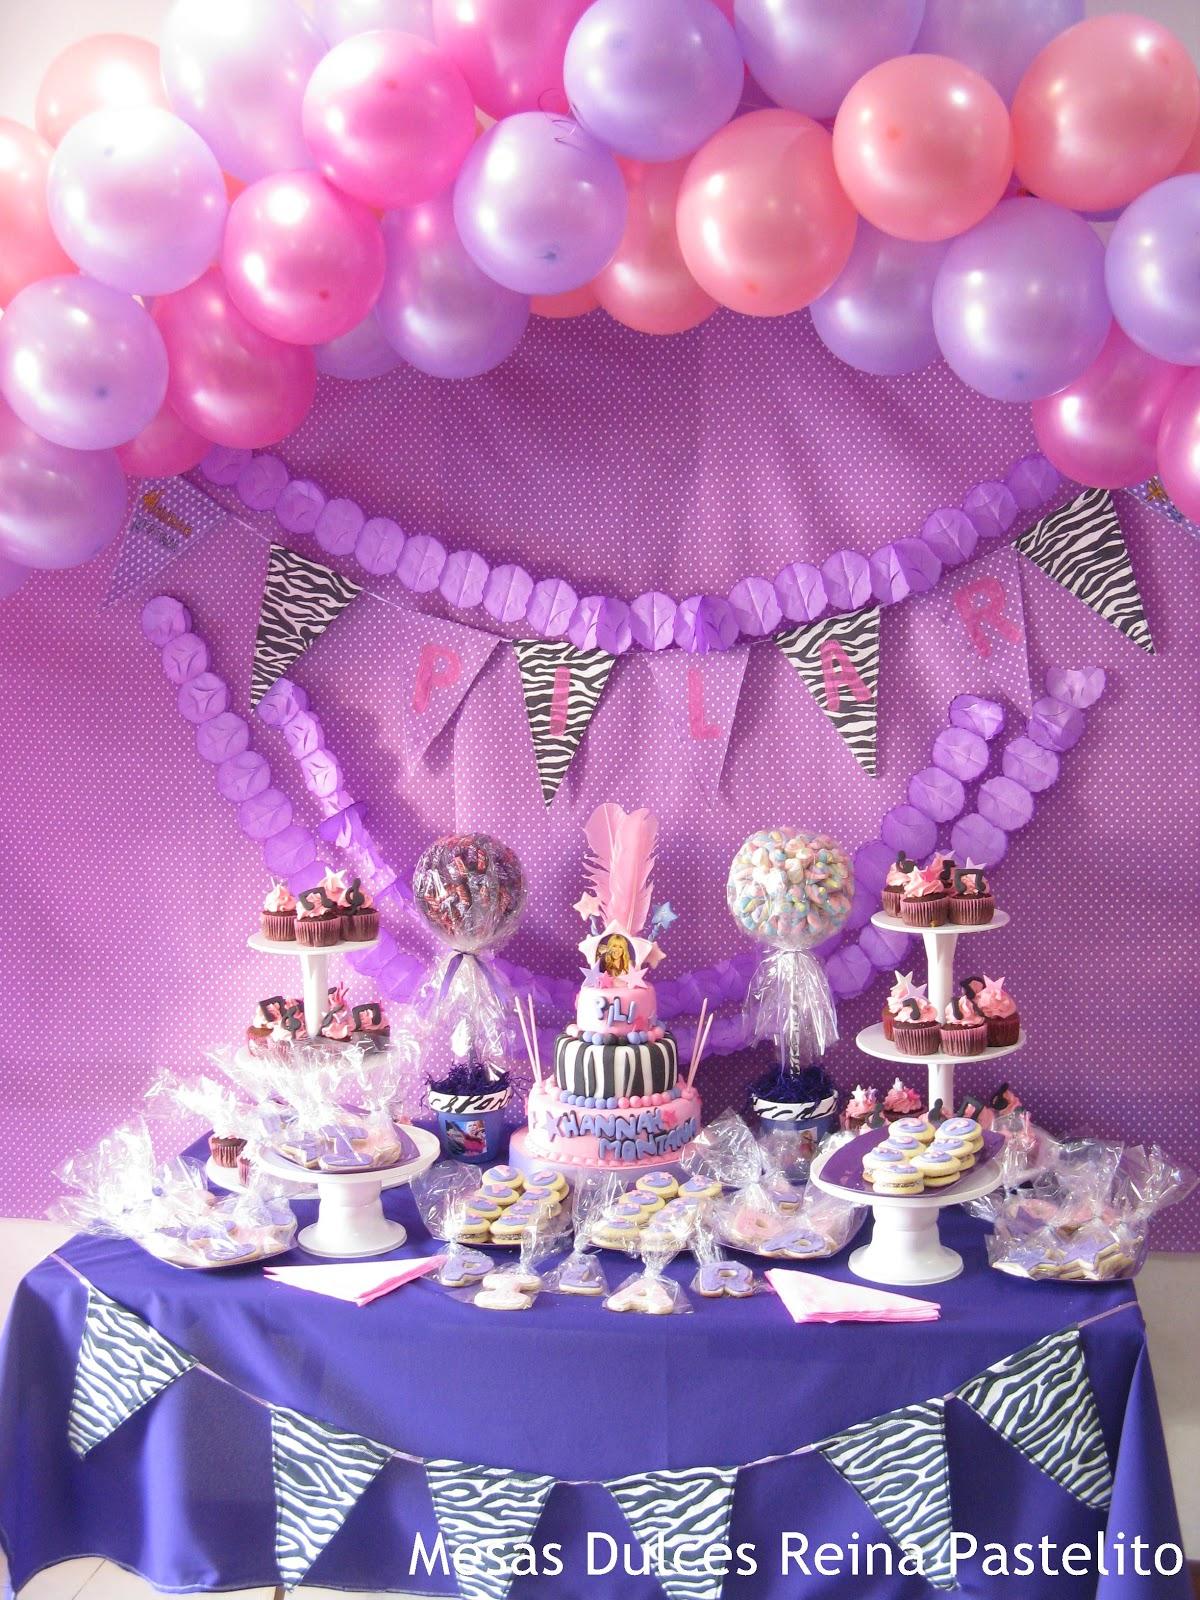 Reina Pastelito Cupcakes Tortas Mesas Dulces Tematicas